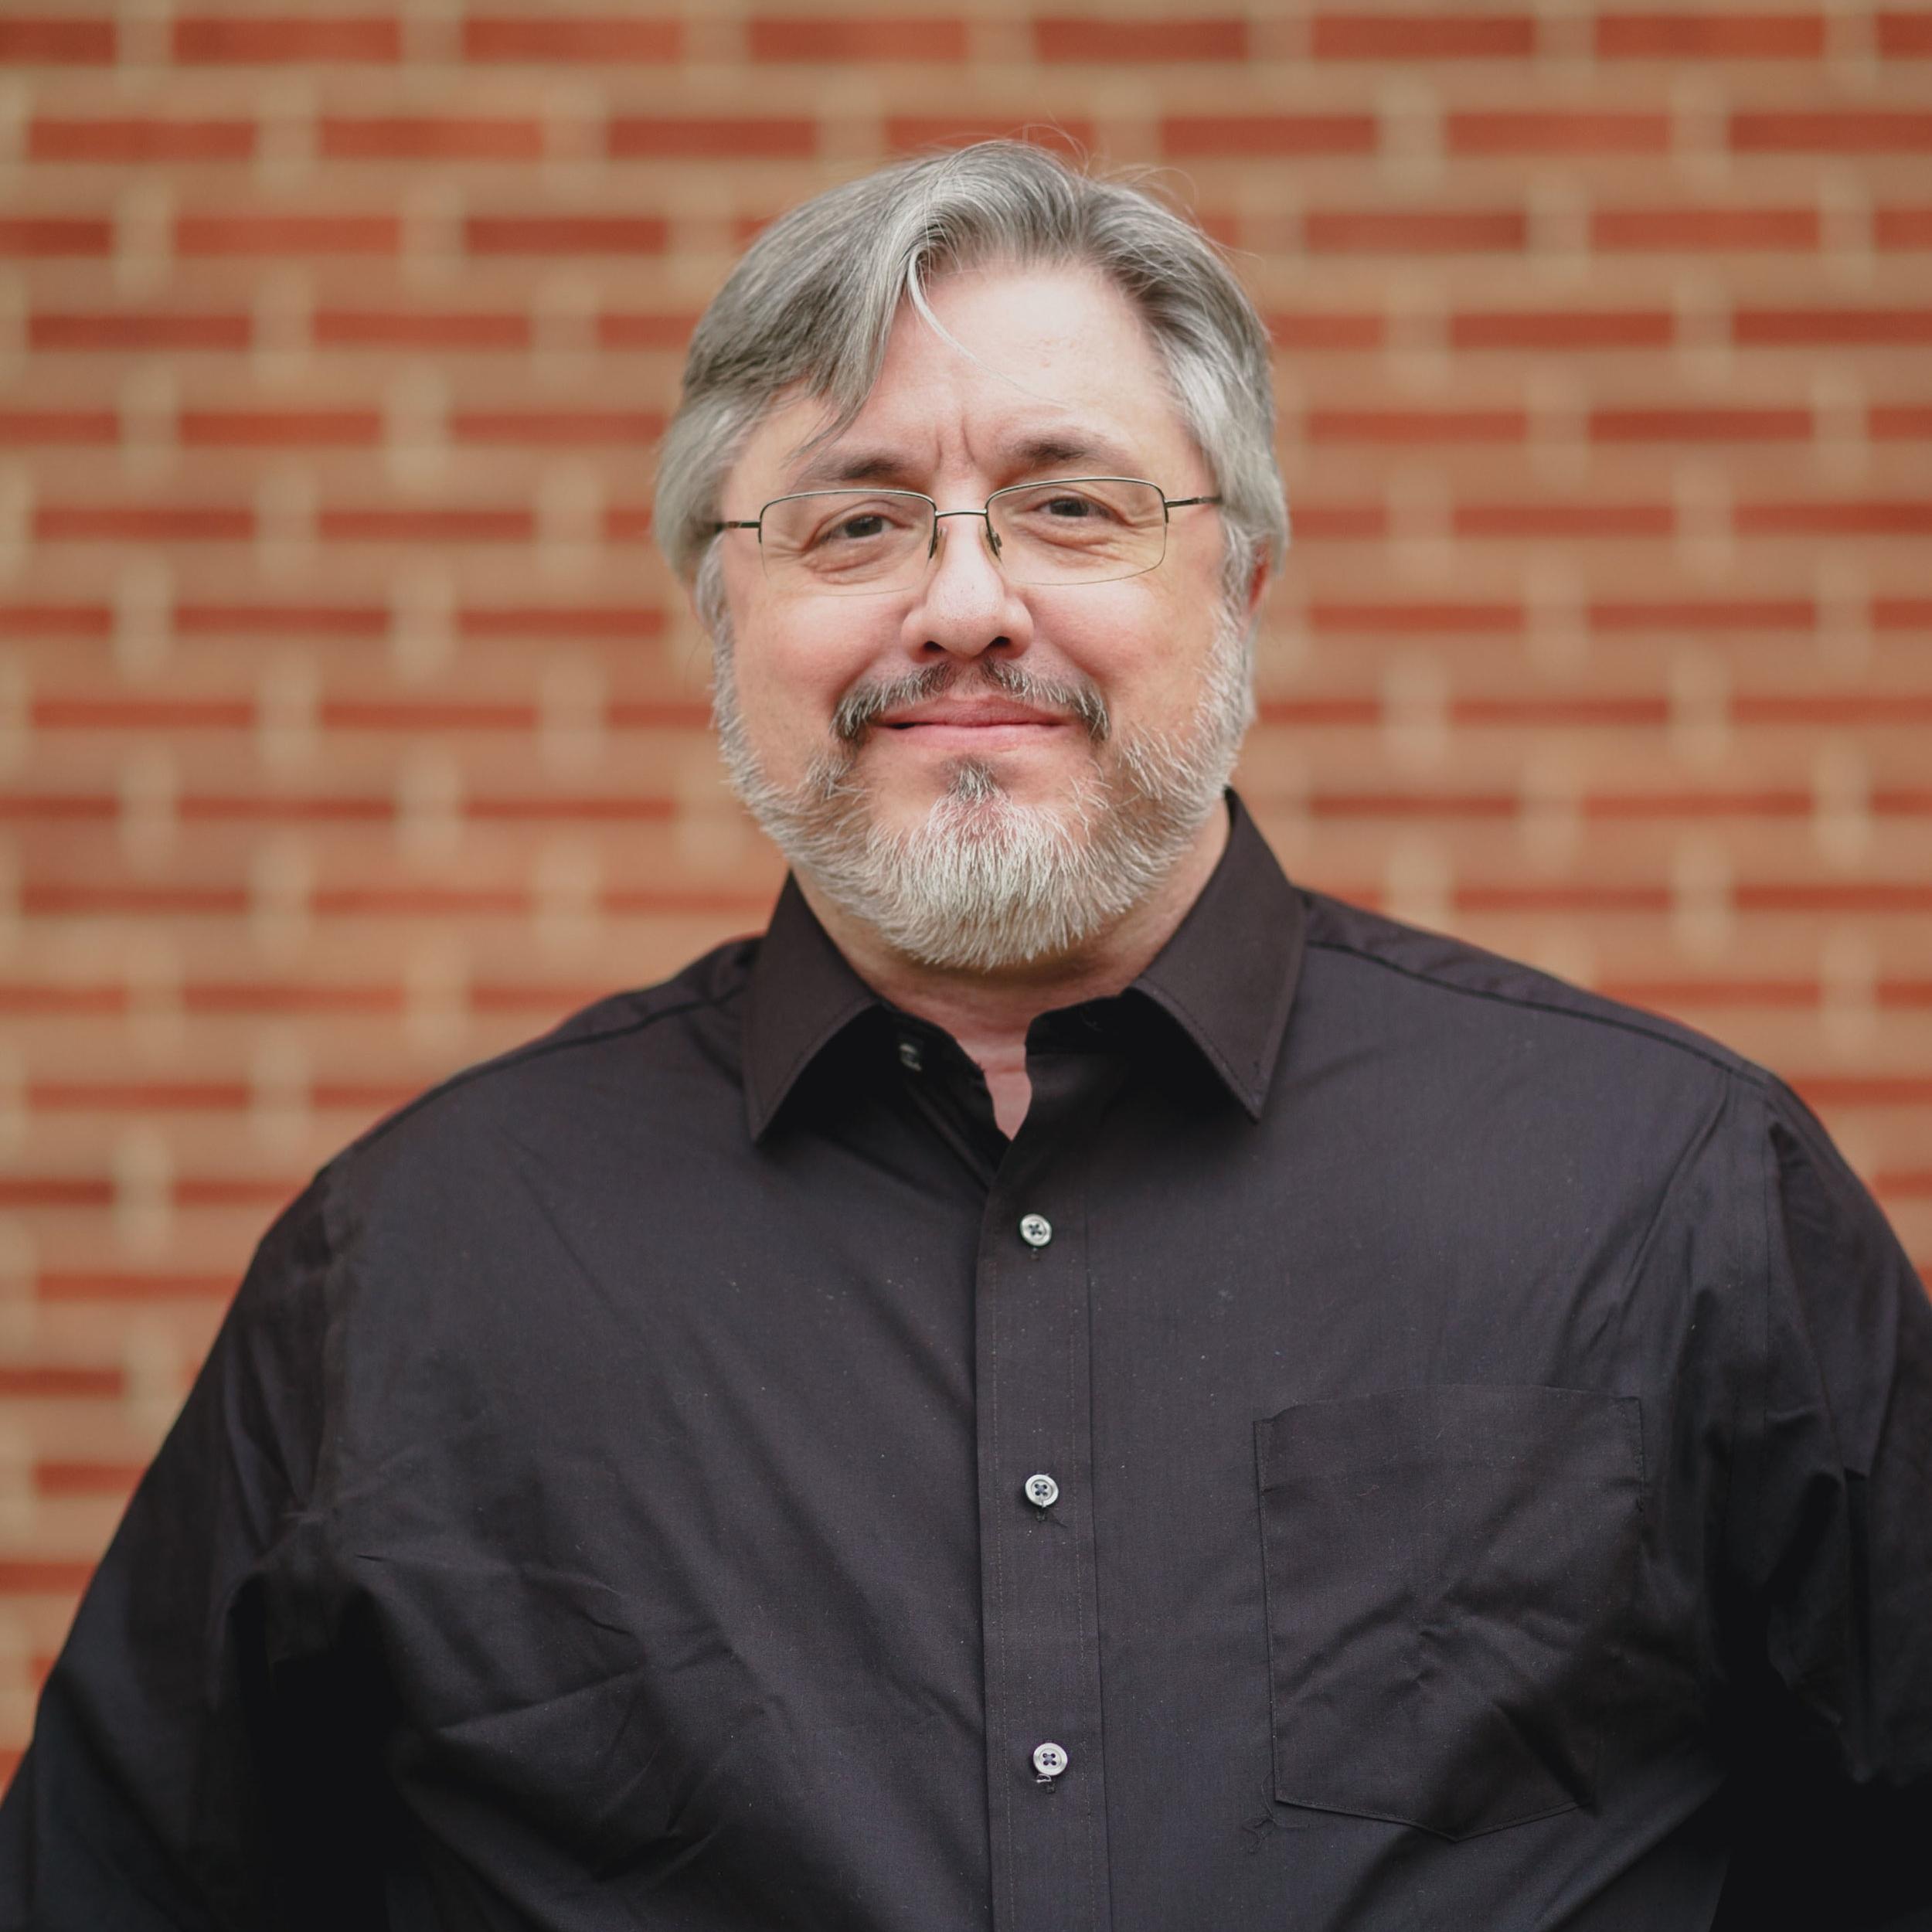 Rev. Rick Saunders Church Counselor - rsaunders@fbcwoodbridge.org